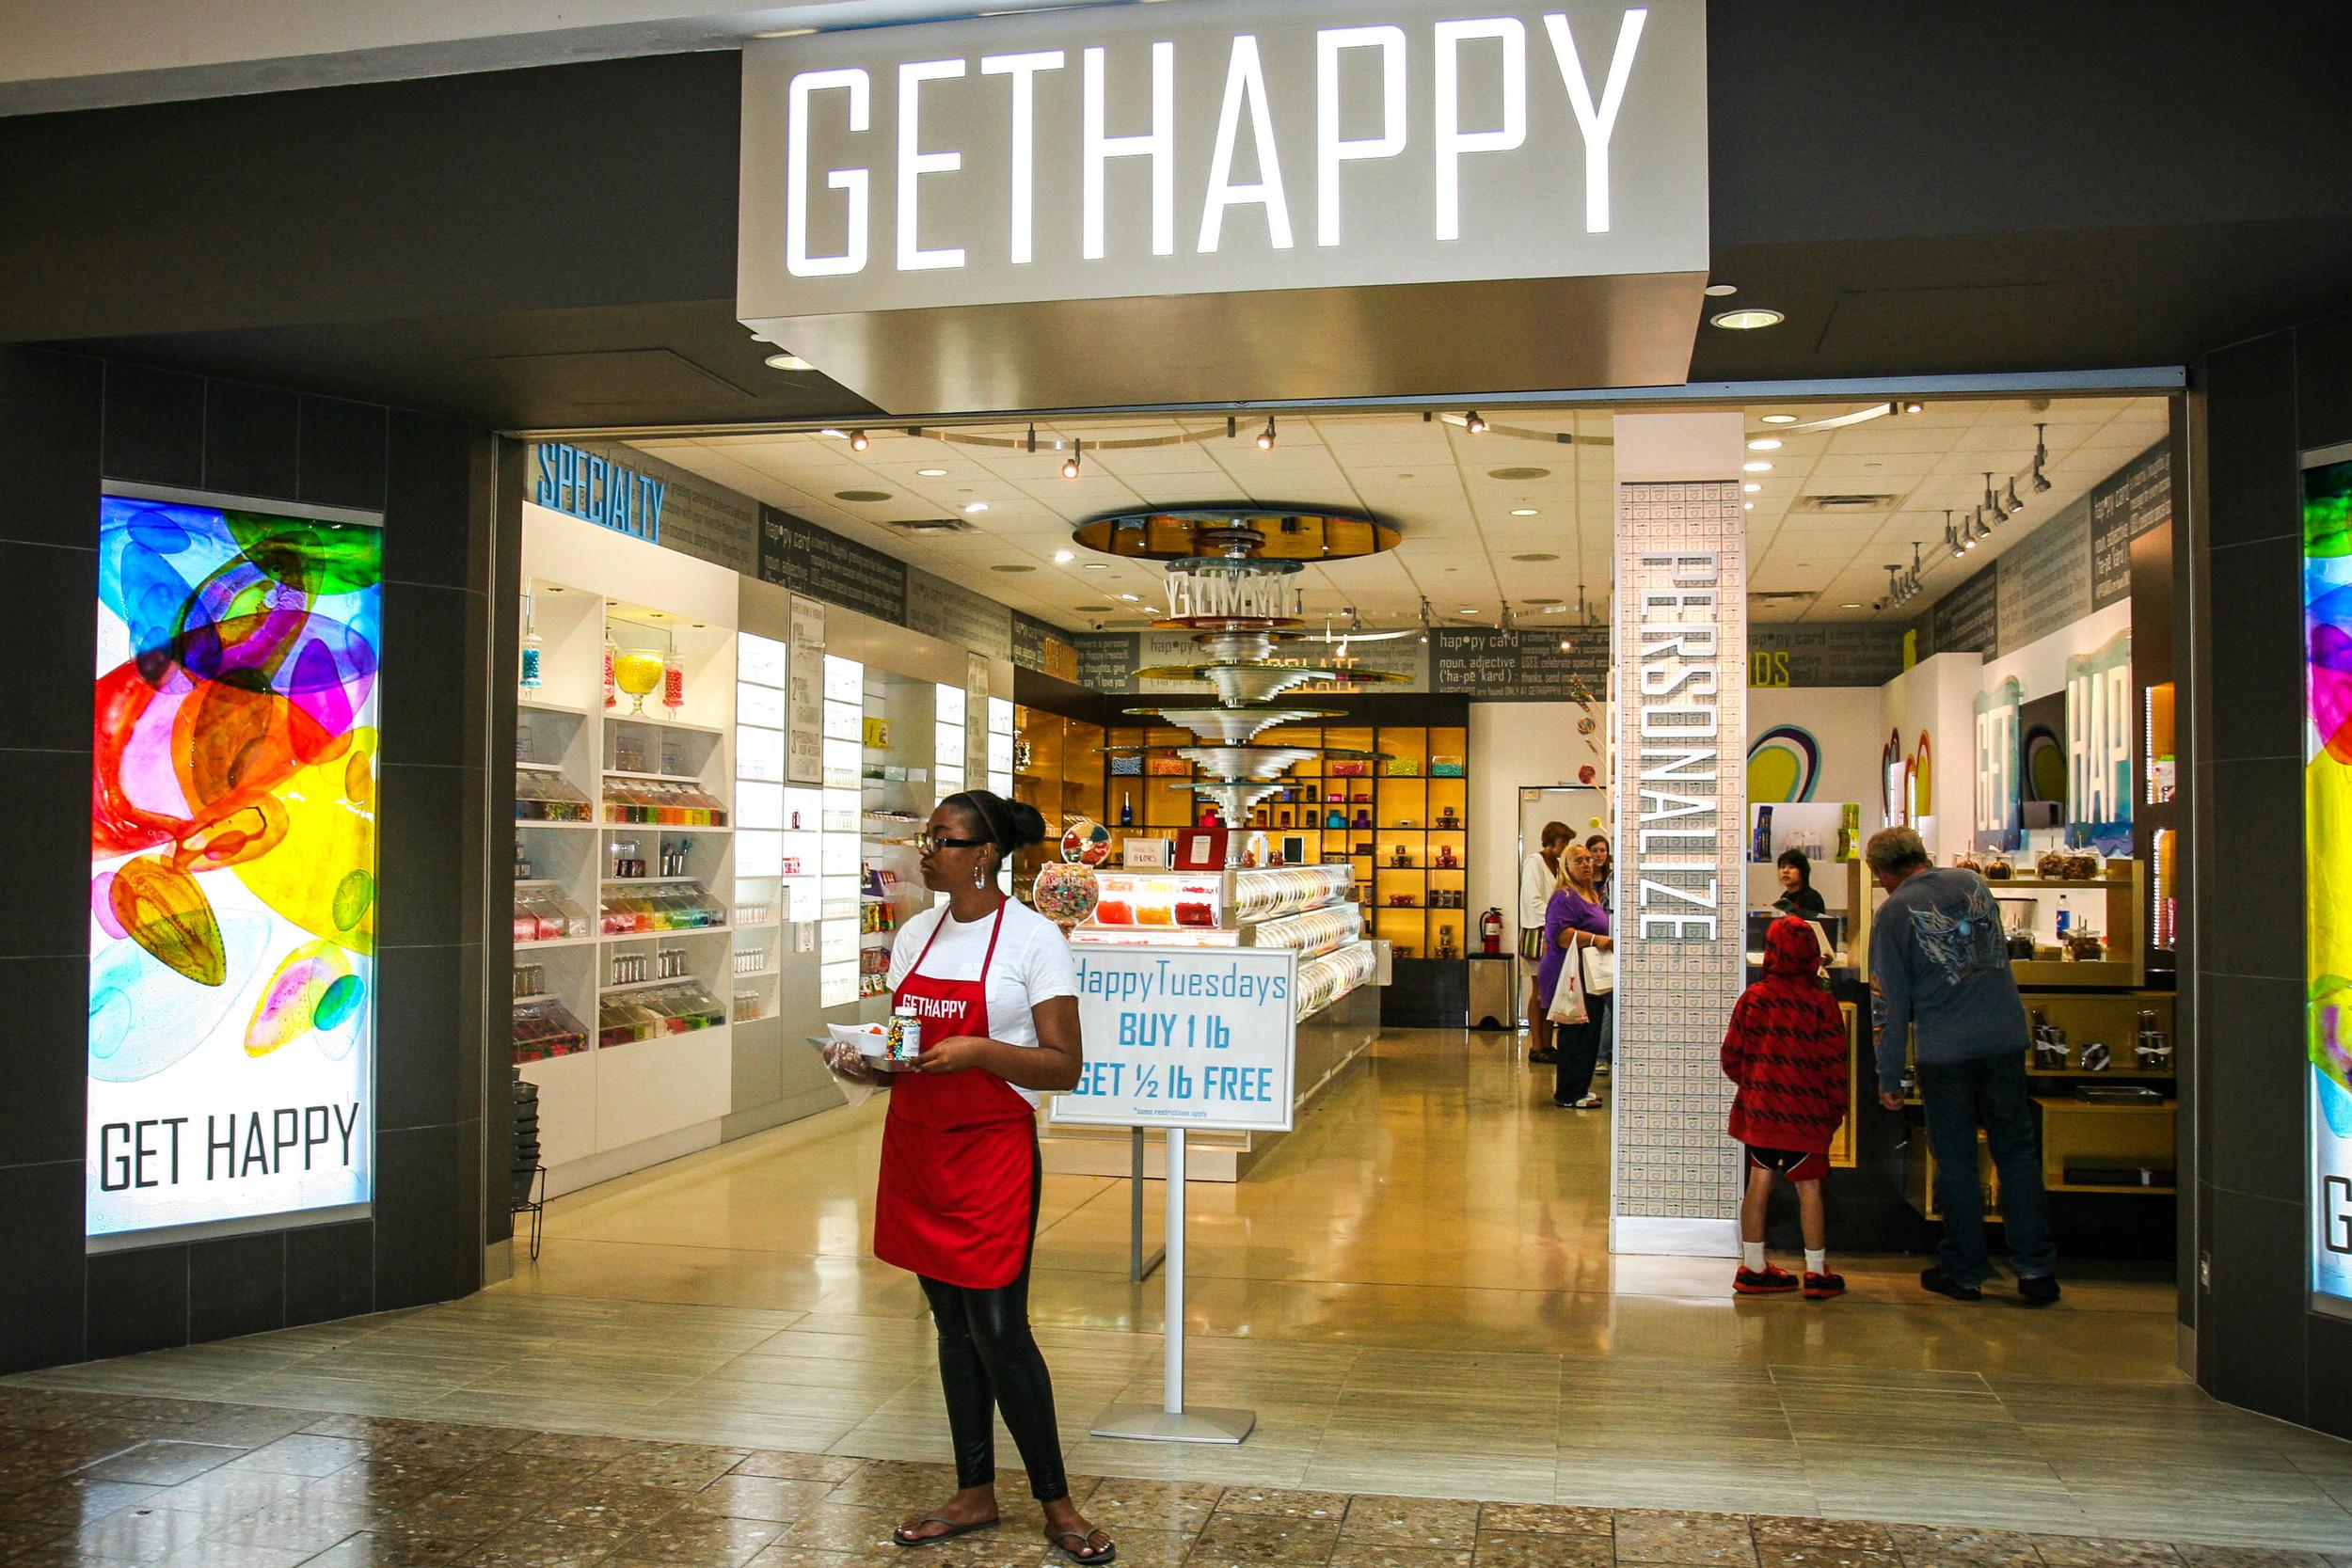 gethappy_retail-4.jpg